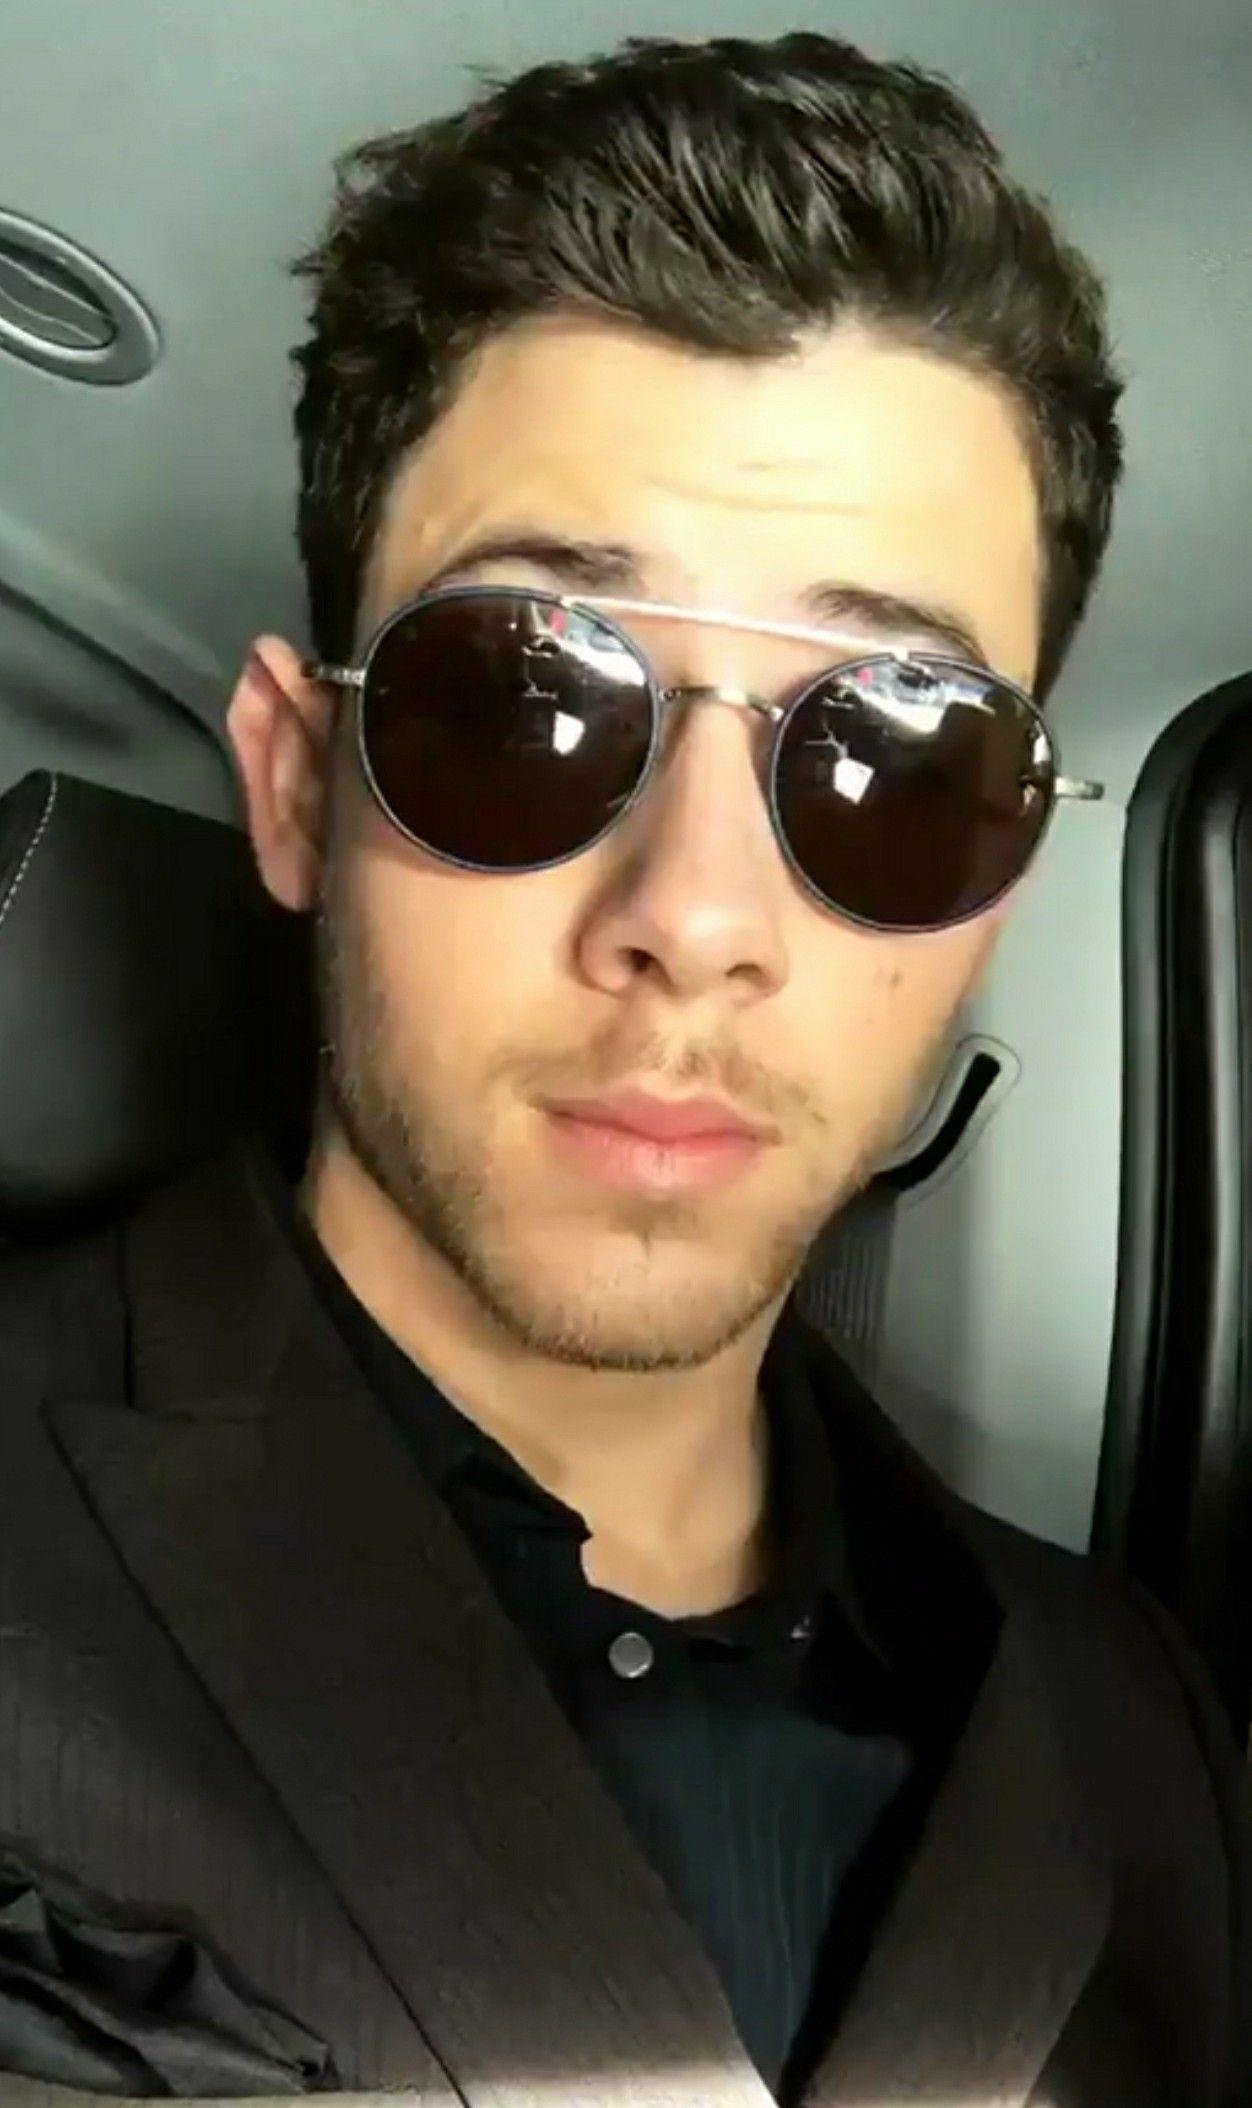 Nick Jonas Starbucks Hottie - Nick Jonas Photo (31511873